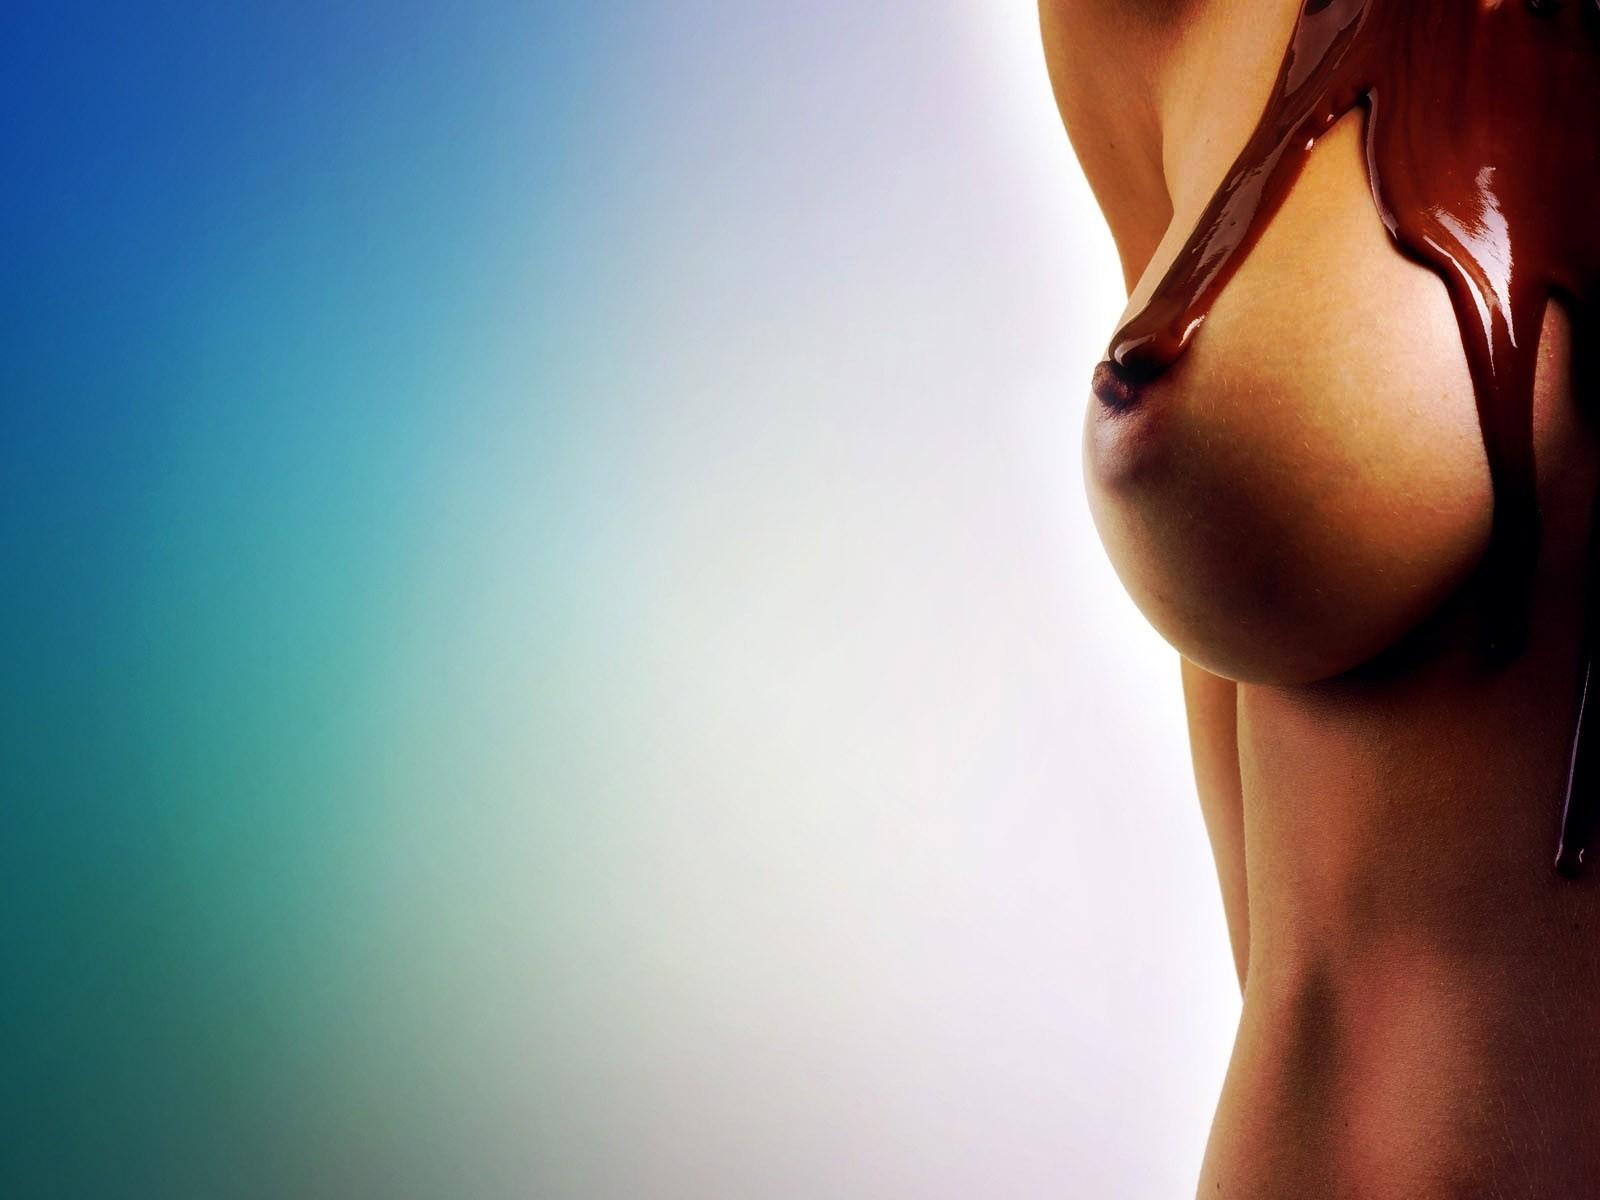 девушка шоколад эротика фото раздел порно романтика